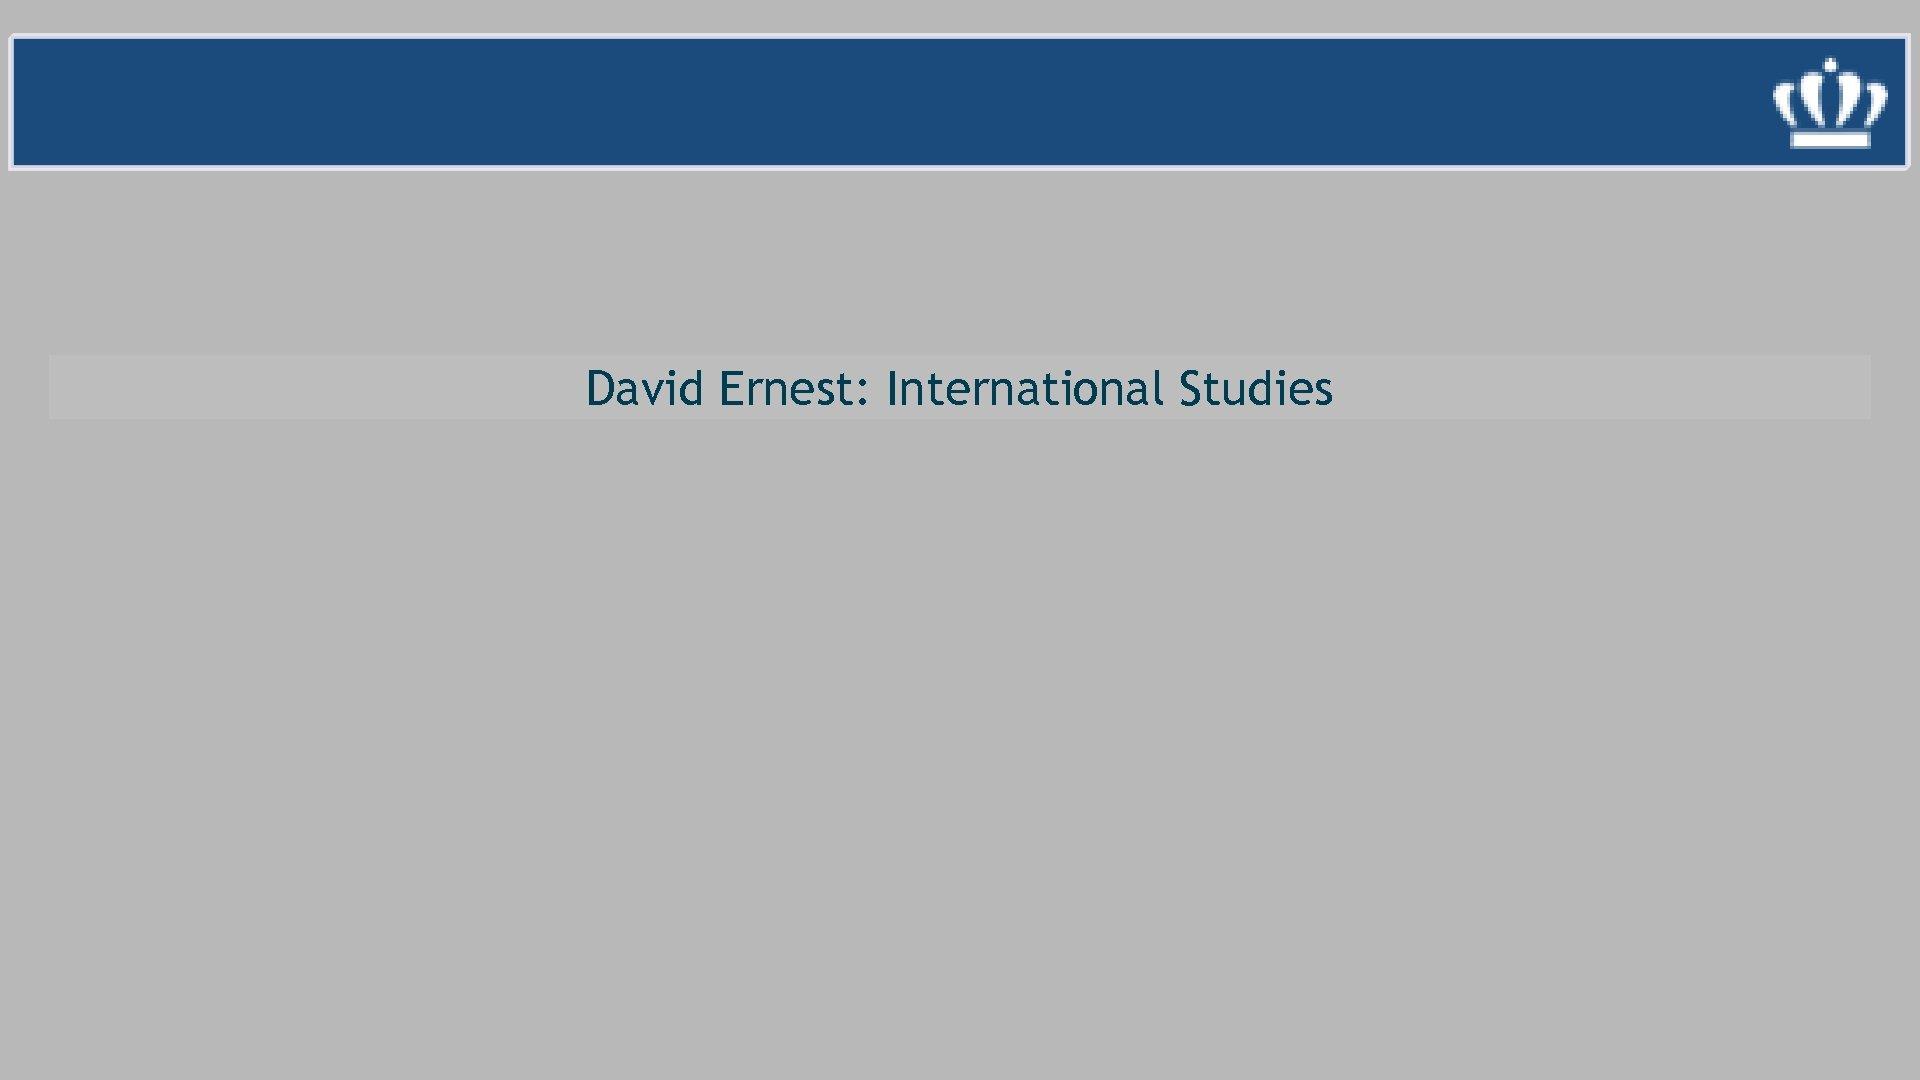 David Ernest: International Studies